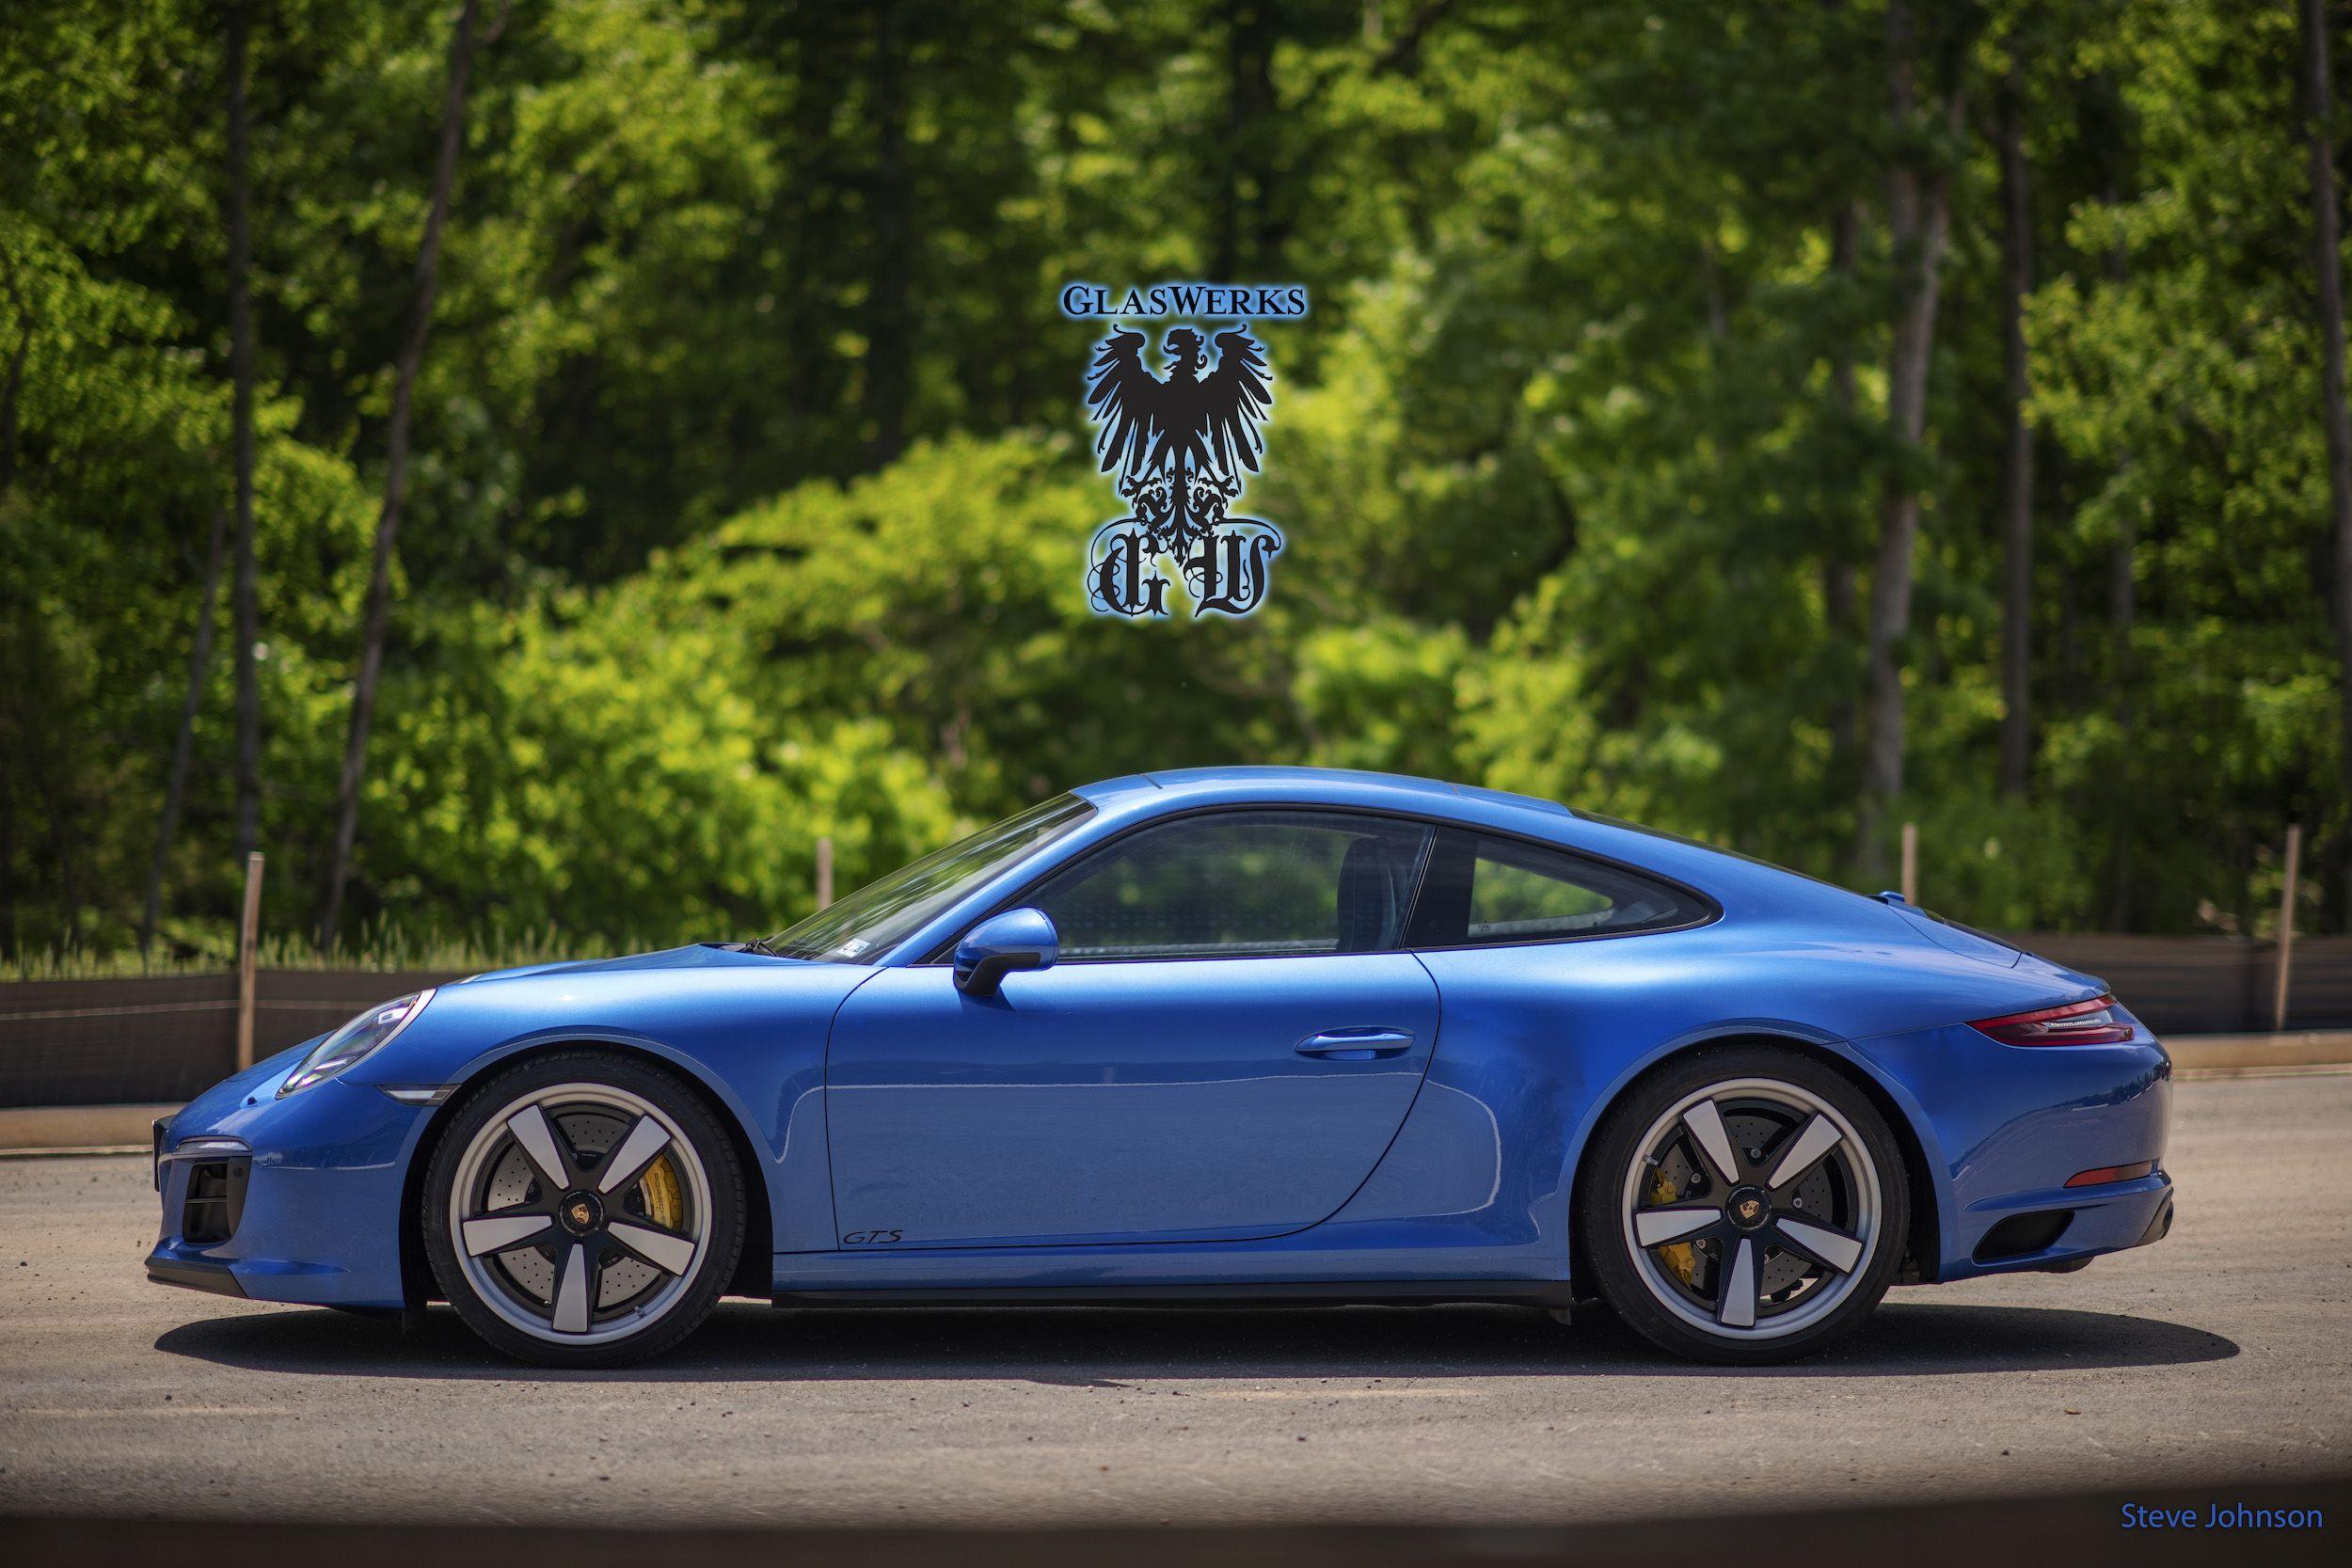 Glaswerks DMV Customer Performance wheels, Porsche 911